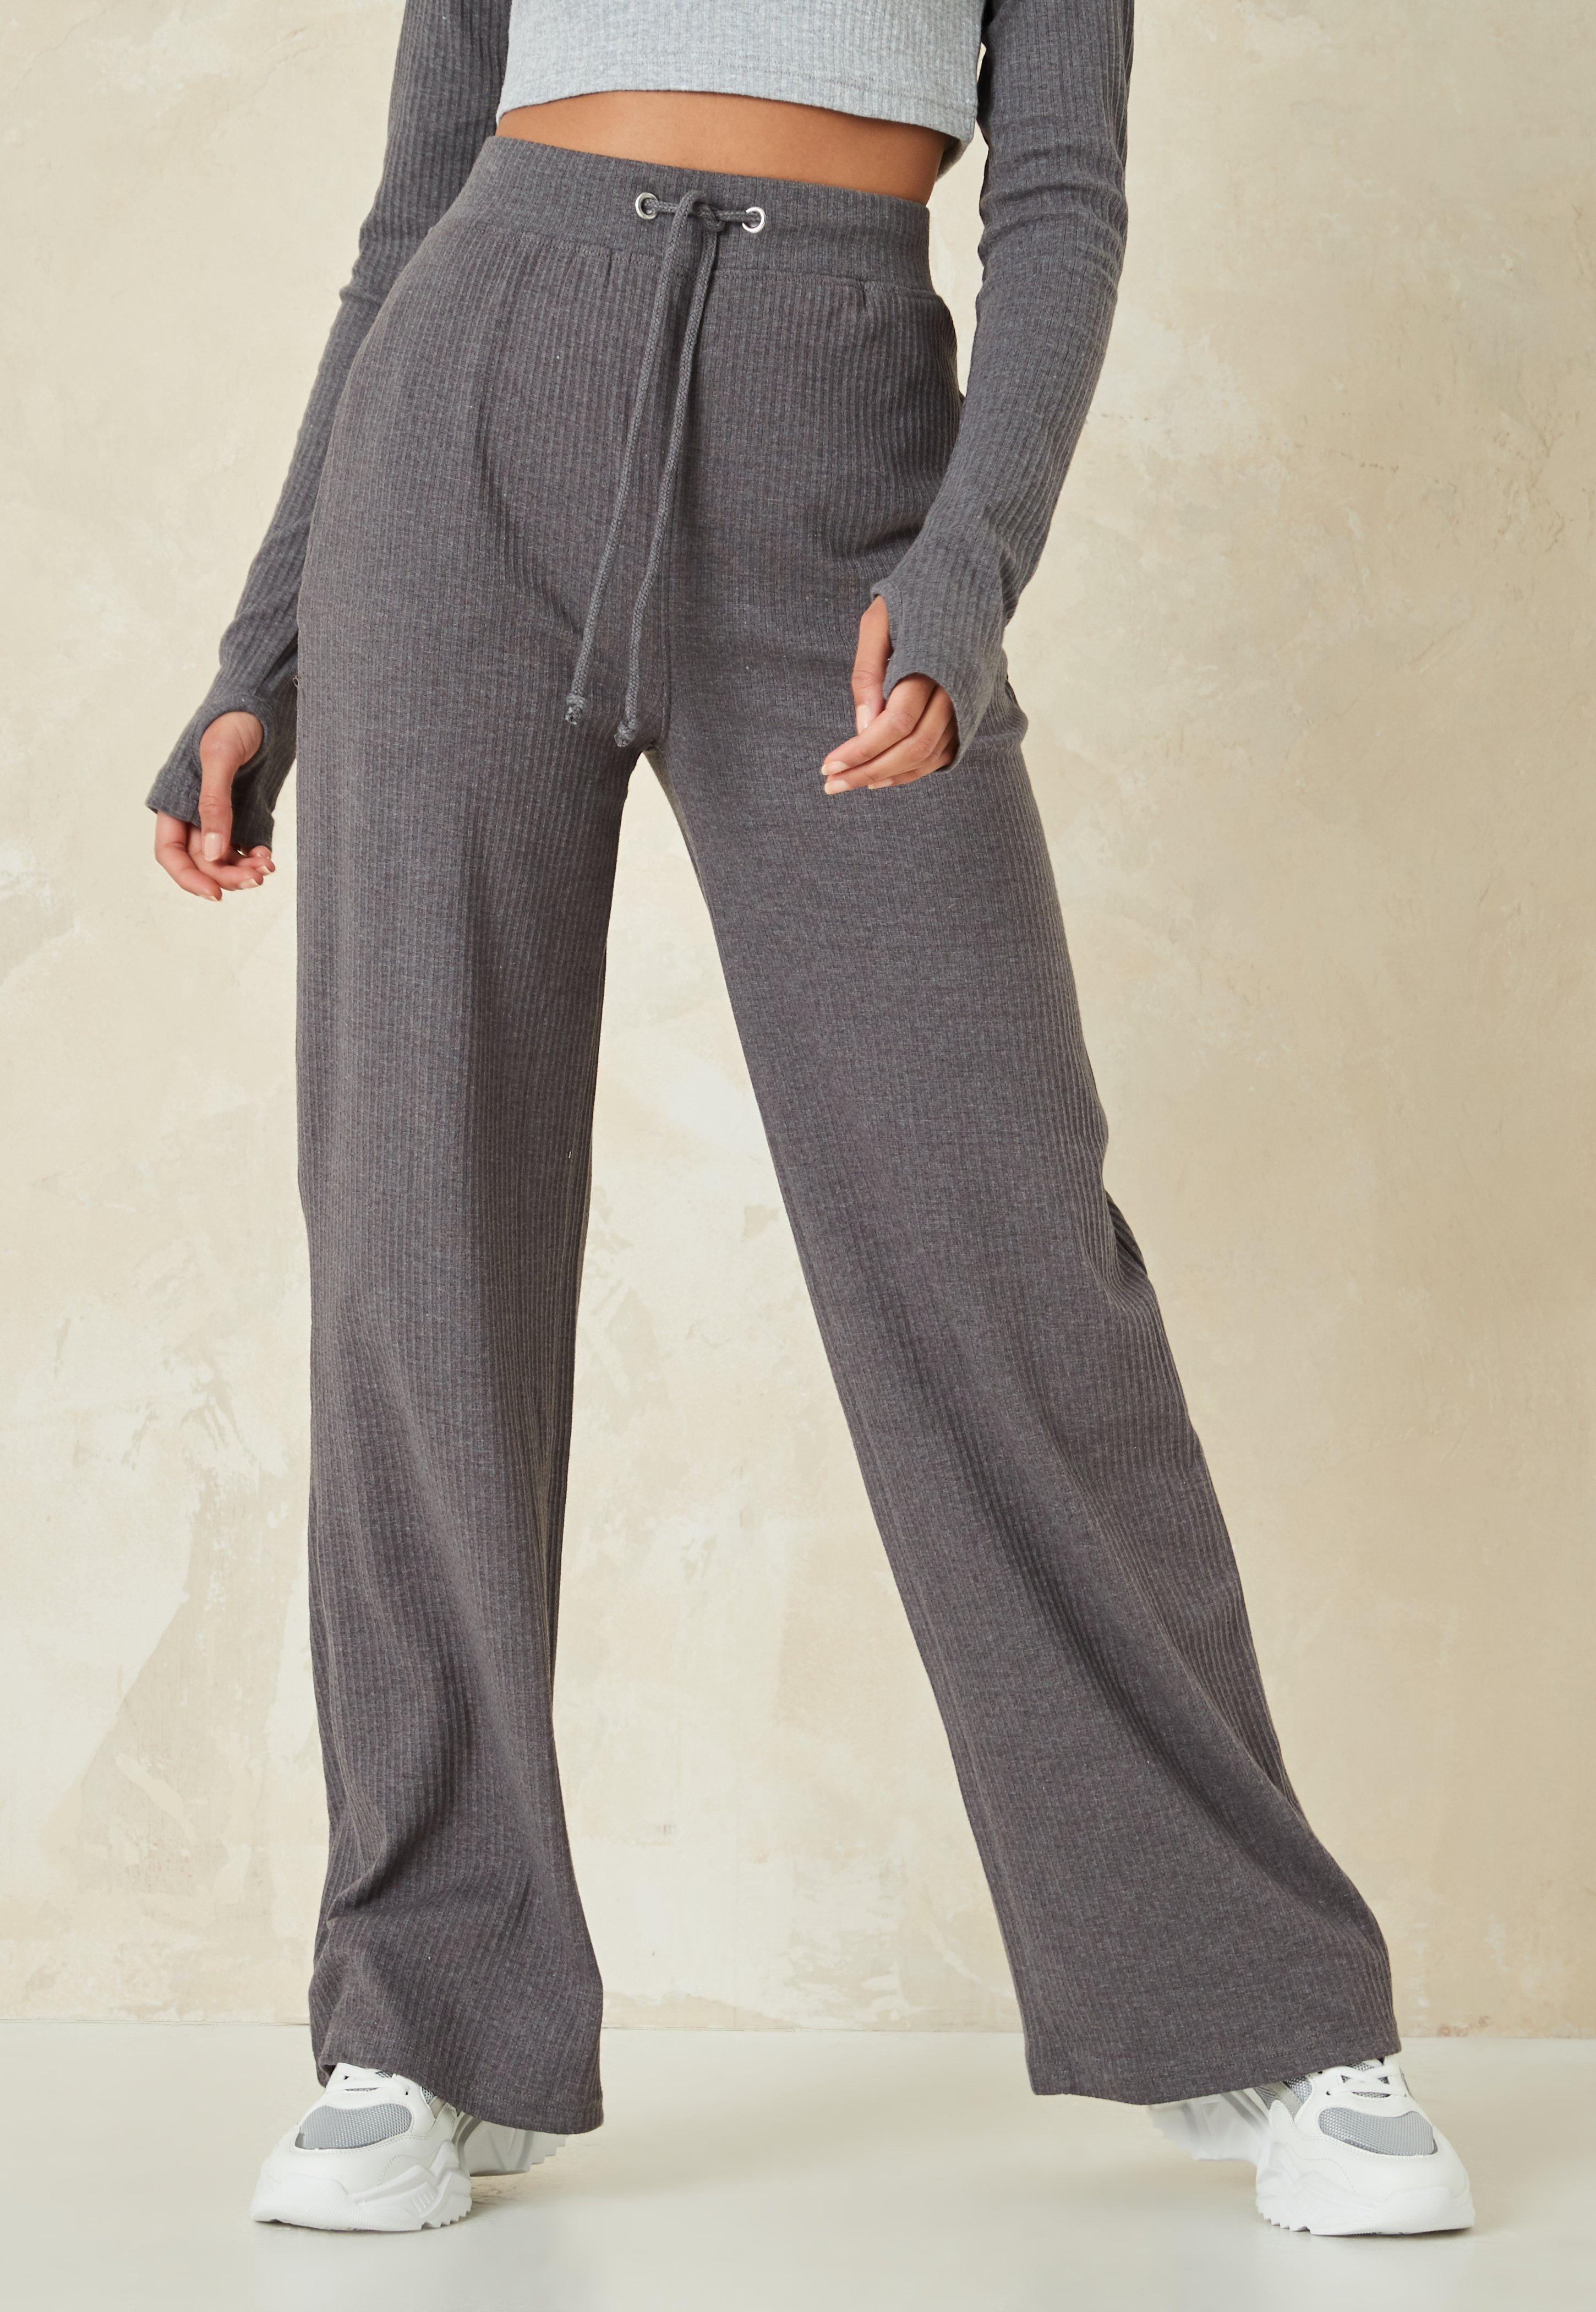 Soft grey corduroy trousers size 30\u201d waist S and size 32\u201d waist M